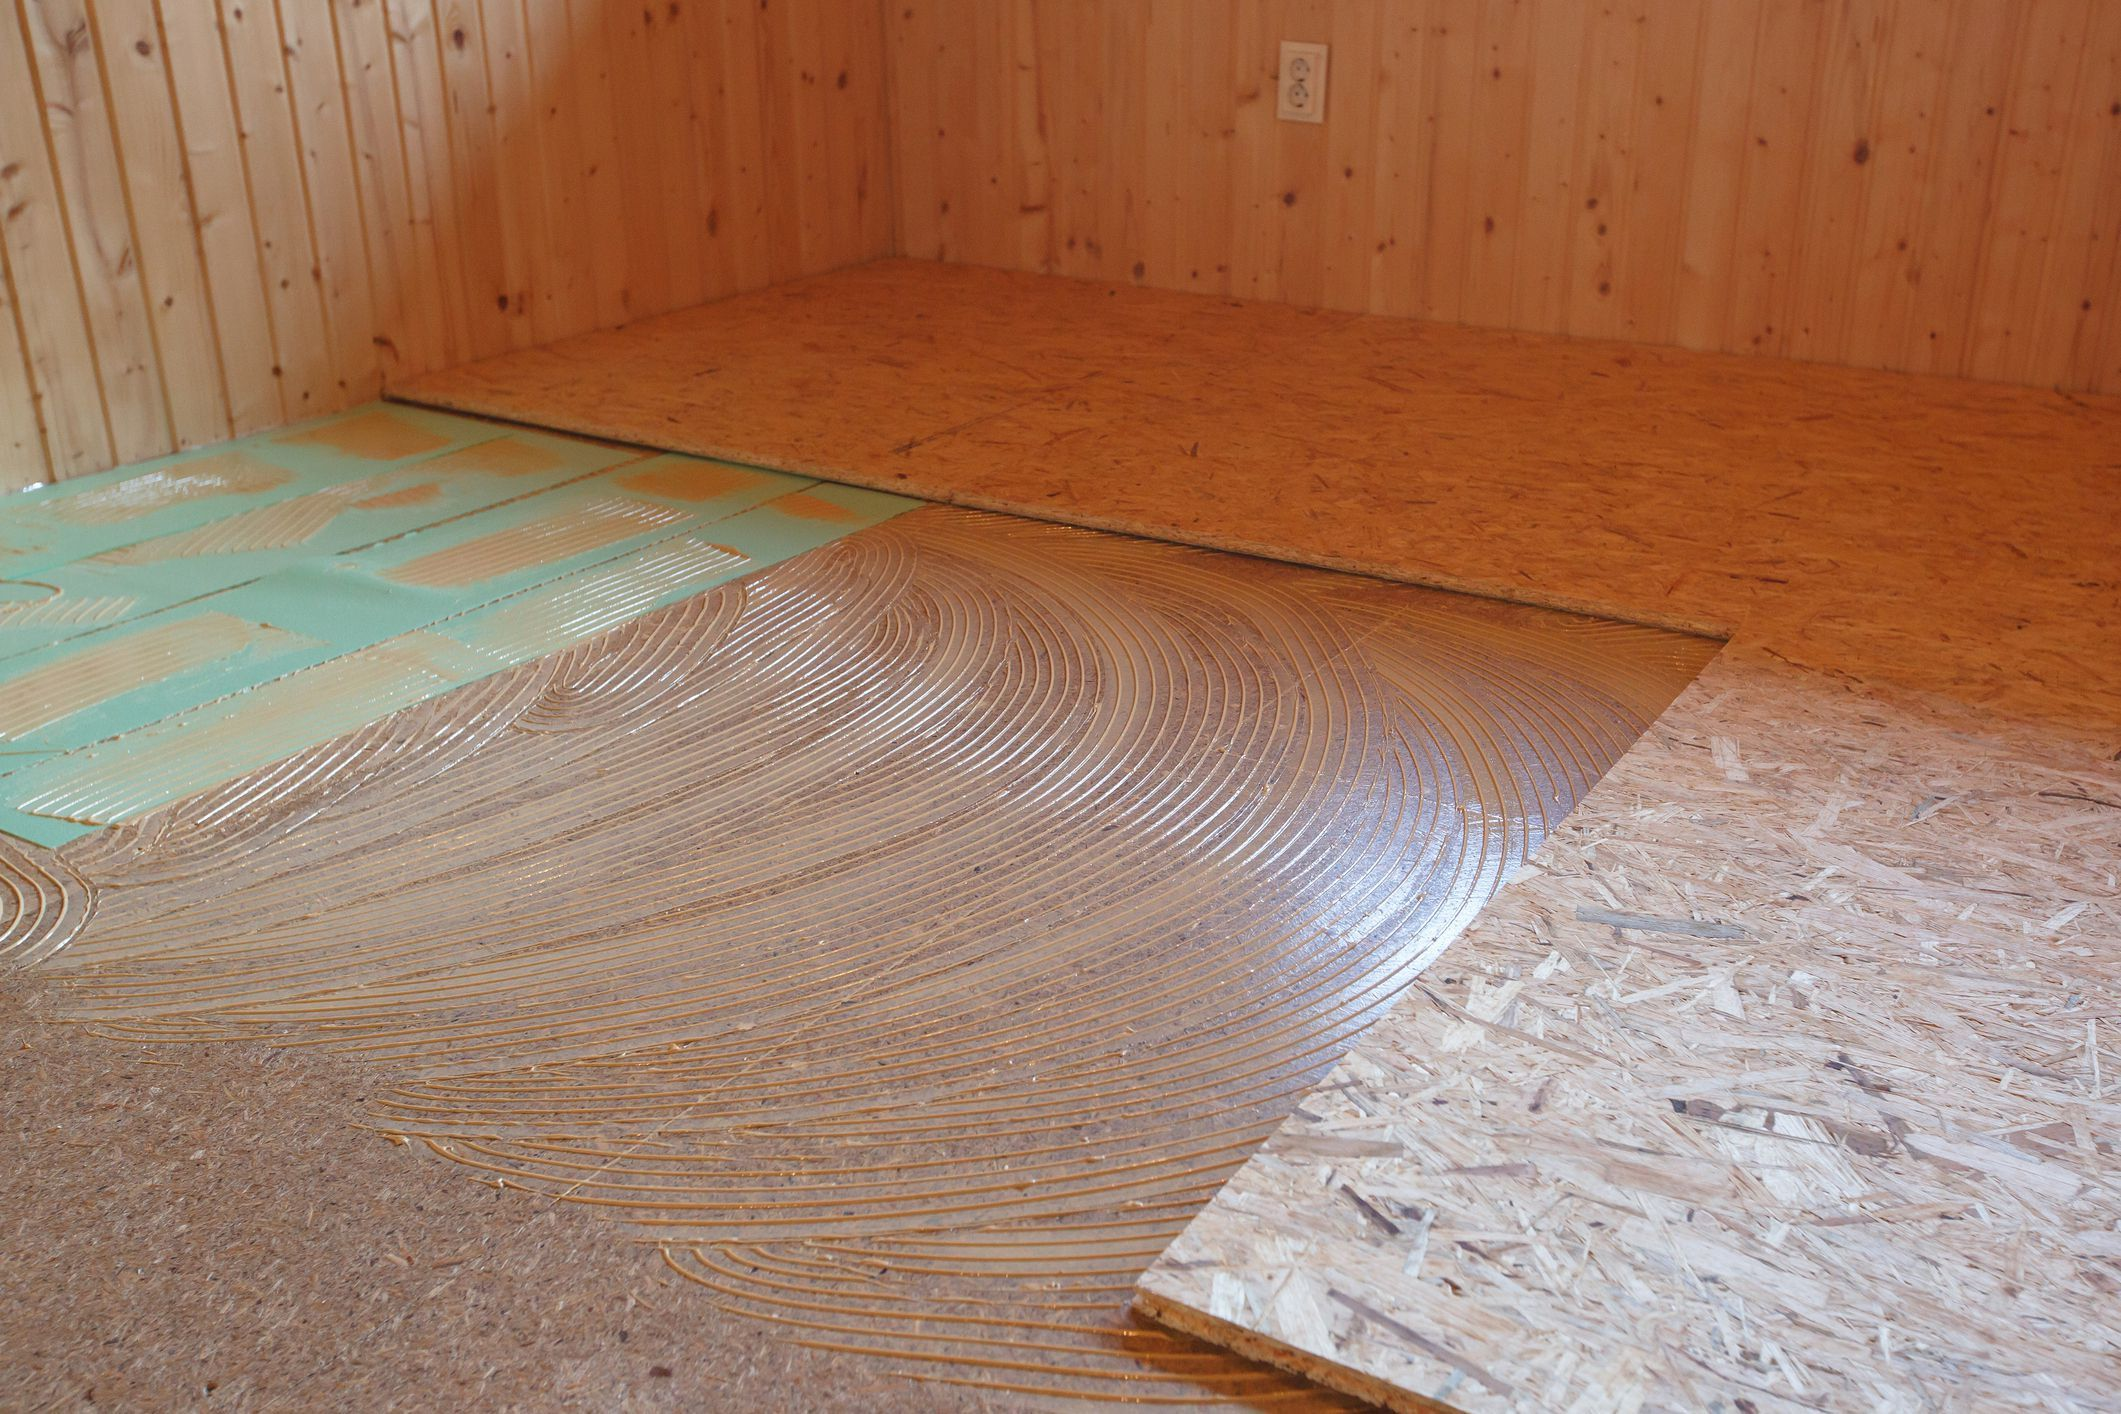 21 Spectacular How To Install Hardwood Floors With Glue Vinyl Flooring Rolls Vinyl Flooring Installing Laminate Flooring